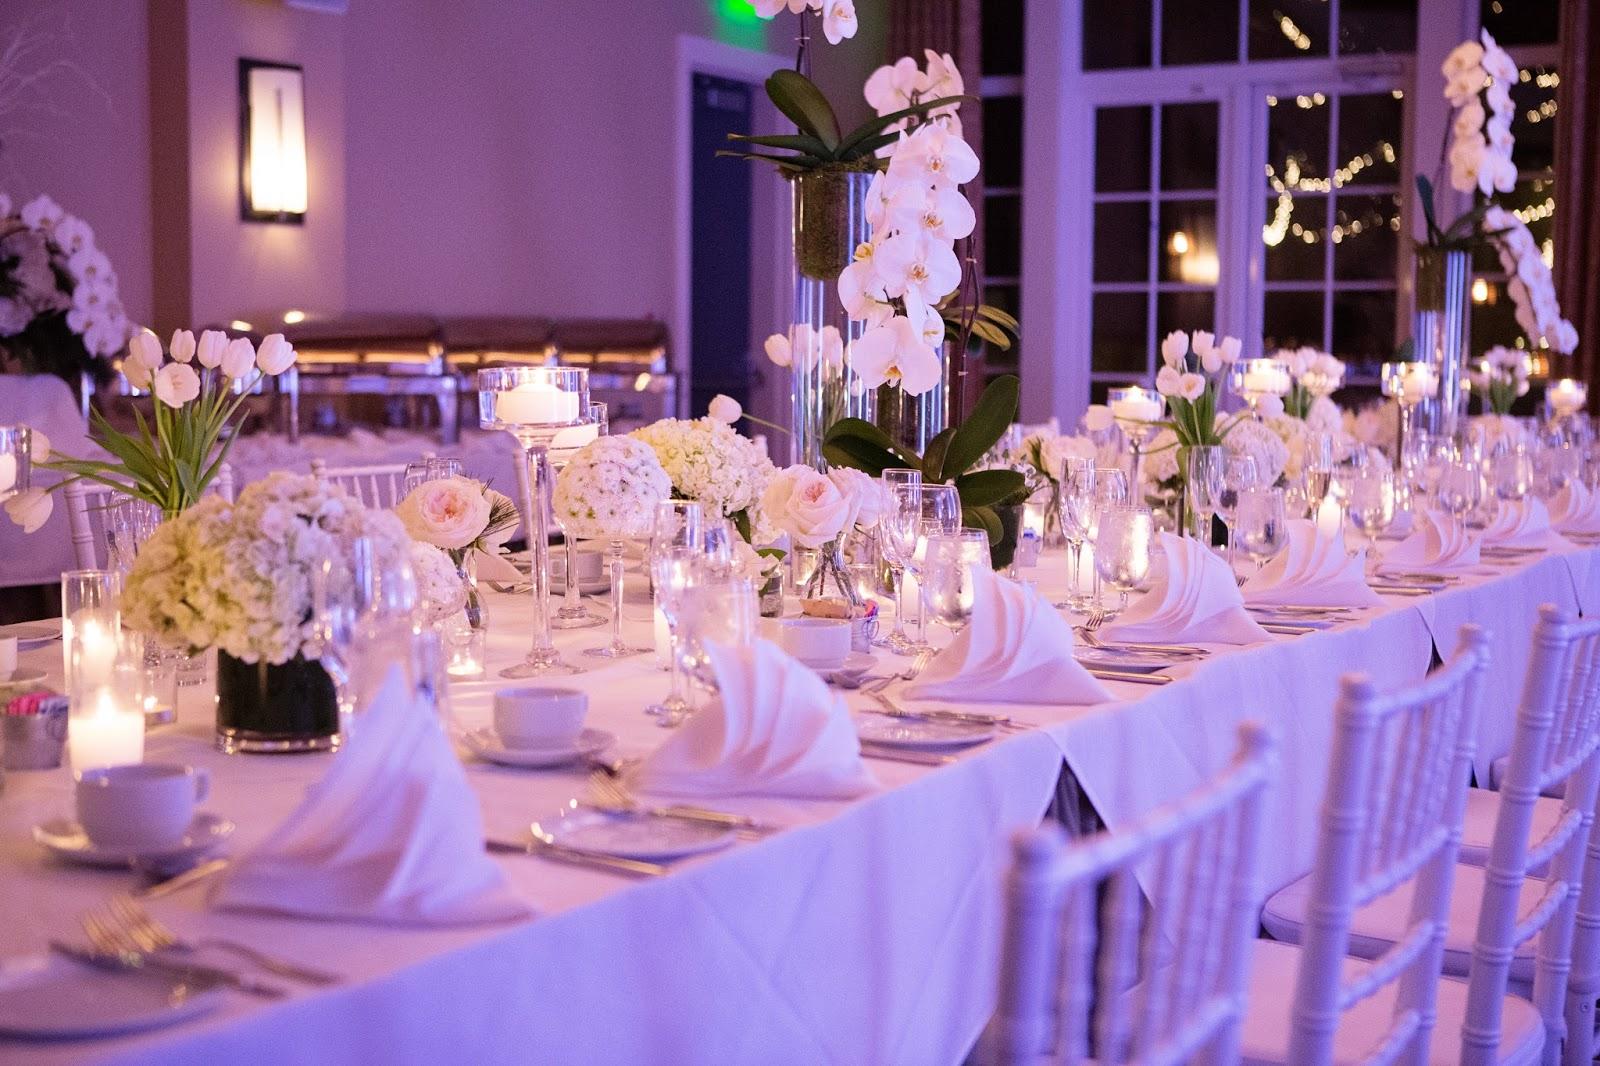 Fiori Floral Design: Talea and Eric\'s Winter Wedding at Alderbrook ...